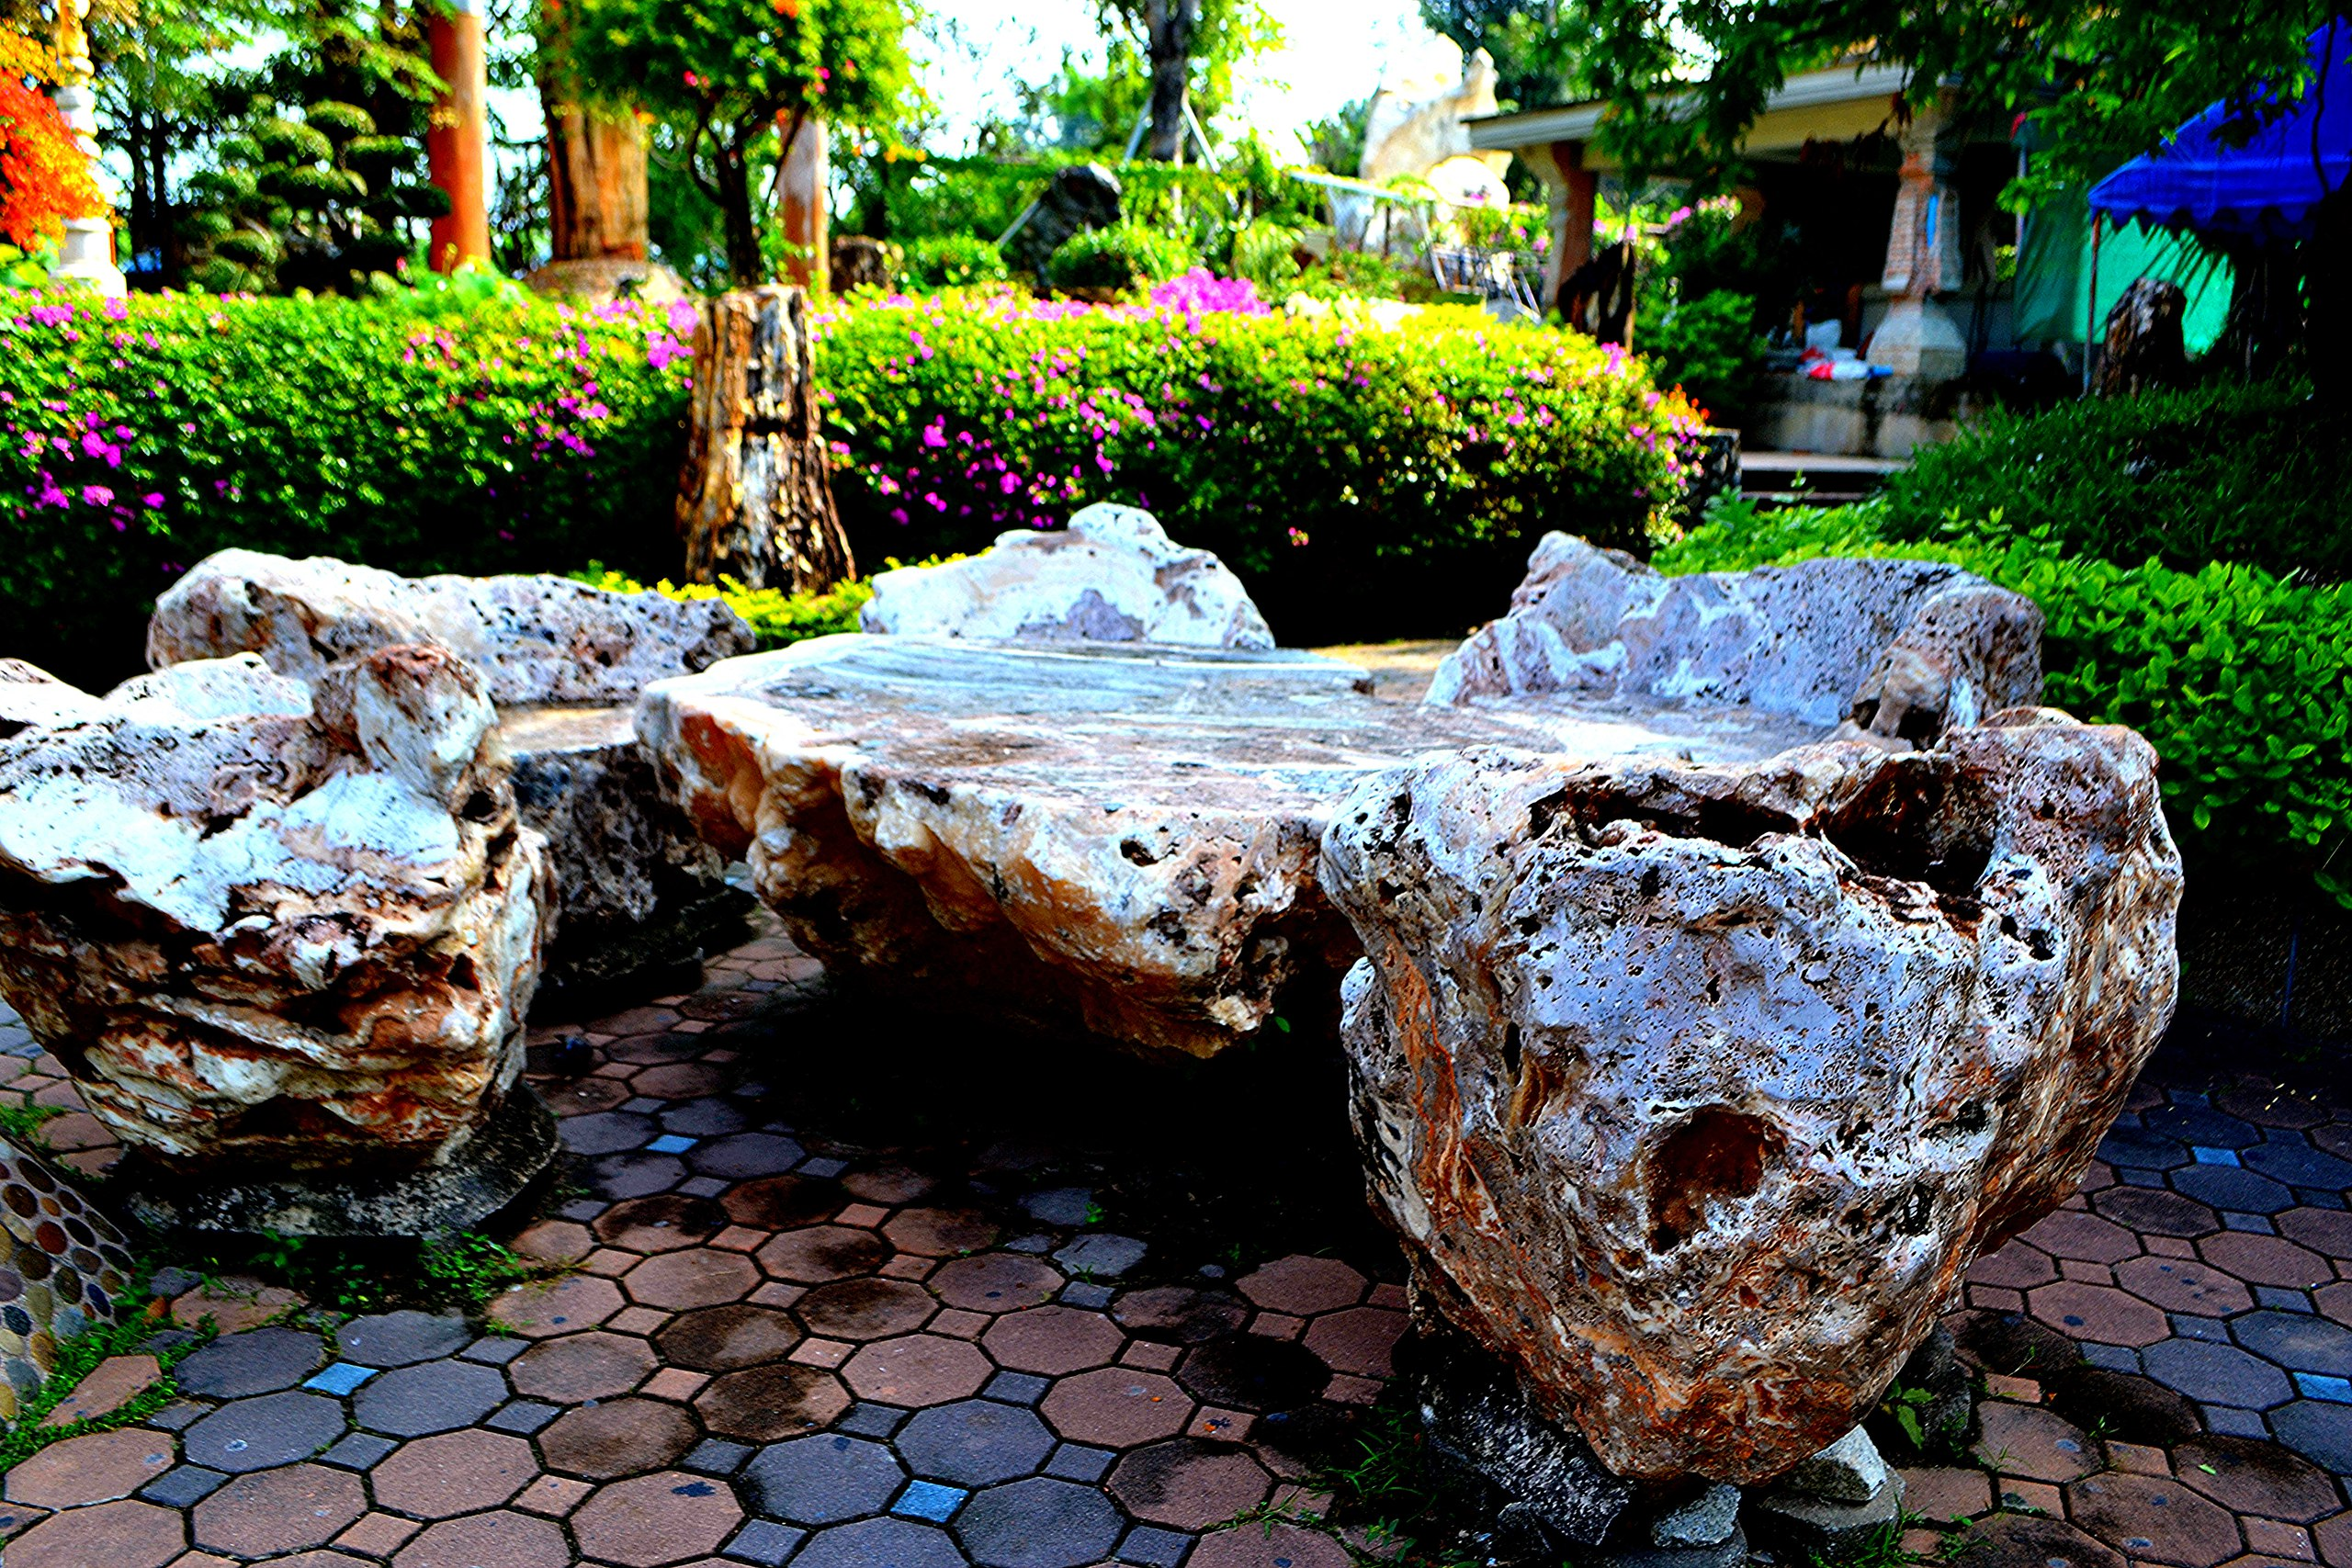 Елена Руденко ( Валтея ). Таиланд. Парк миллионолетних камней и крокодиловая ферма. YZl11fK-LSQ